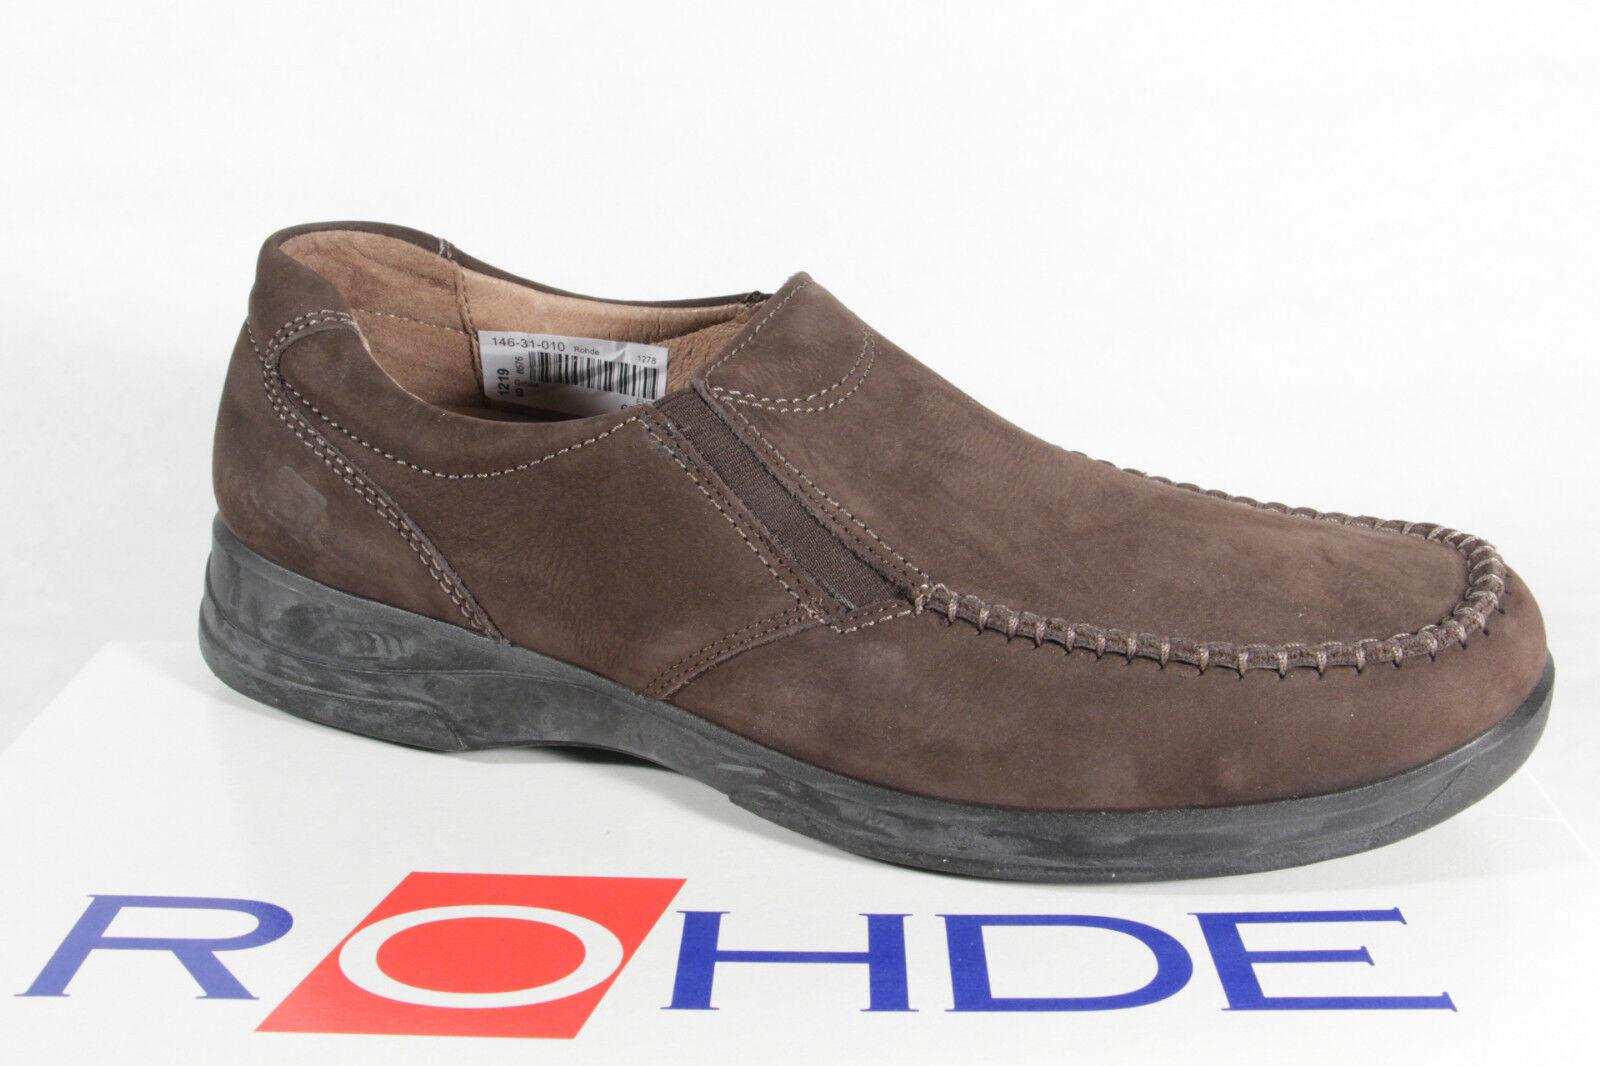 Rohde Herren Slipper Halbschuhe Sneaker braun  NEU